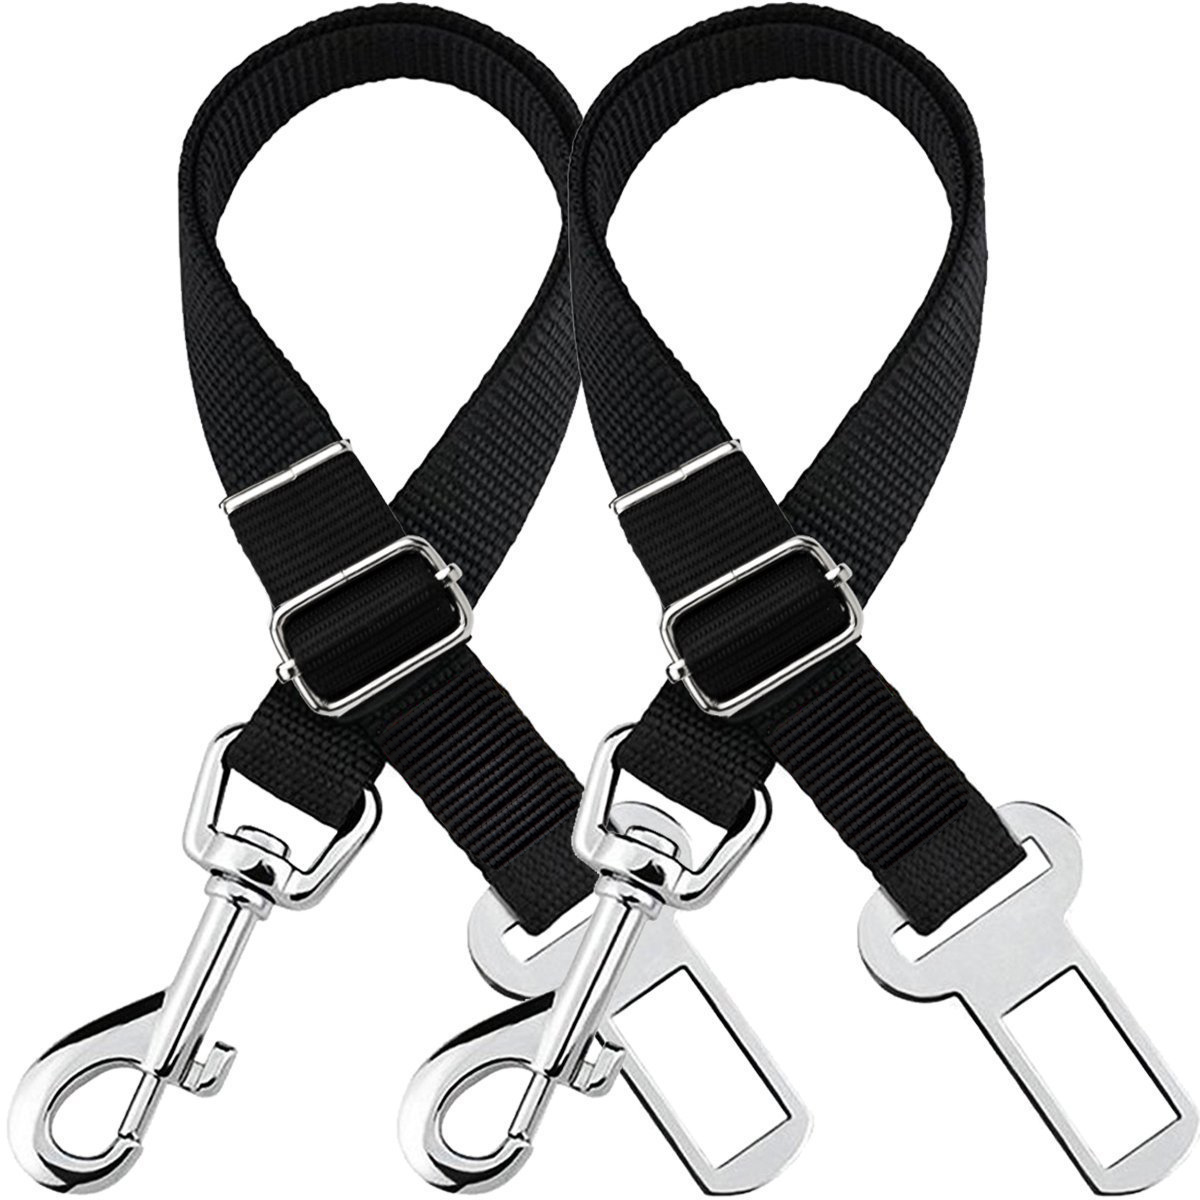 2x Dog Car Seat Belts Buckle Pet Safety Seatbelt Stabilizer